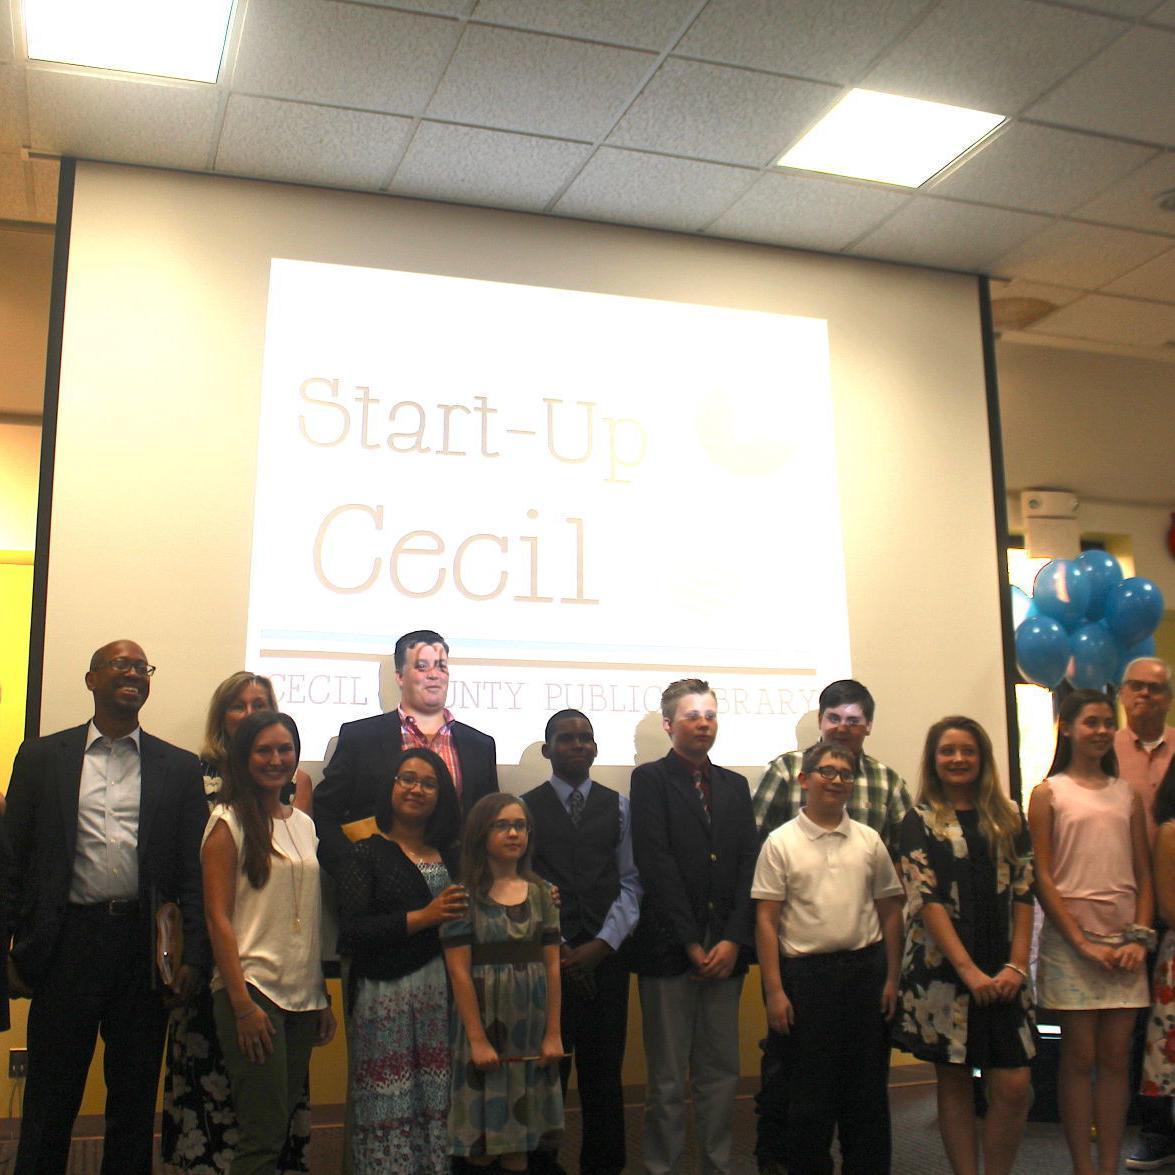 Start-Up Cecil Showcase spotlights teen business ideas